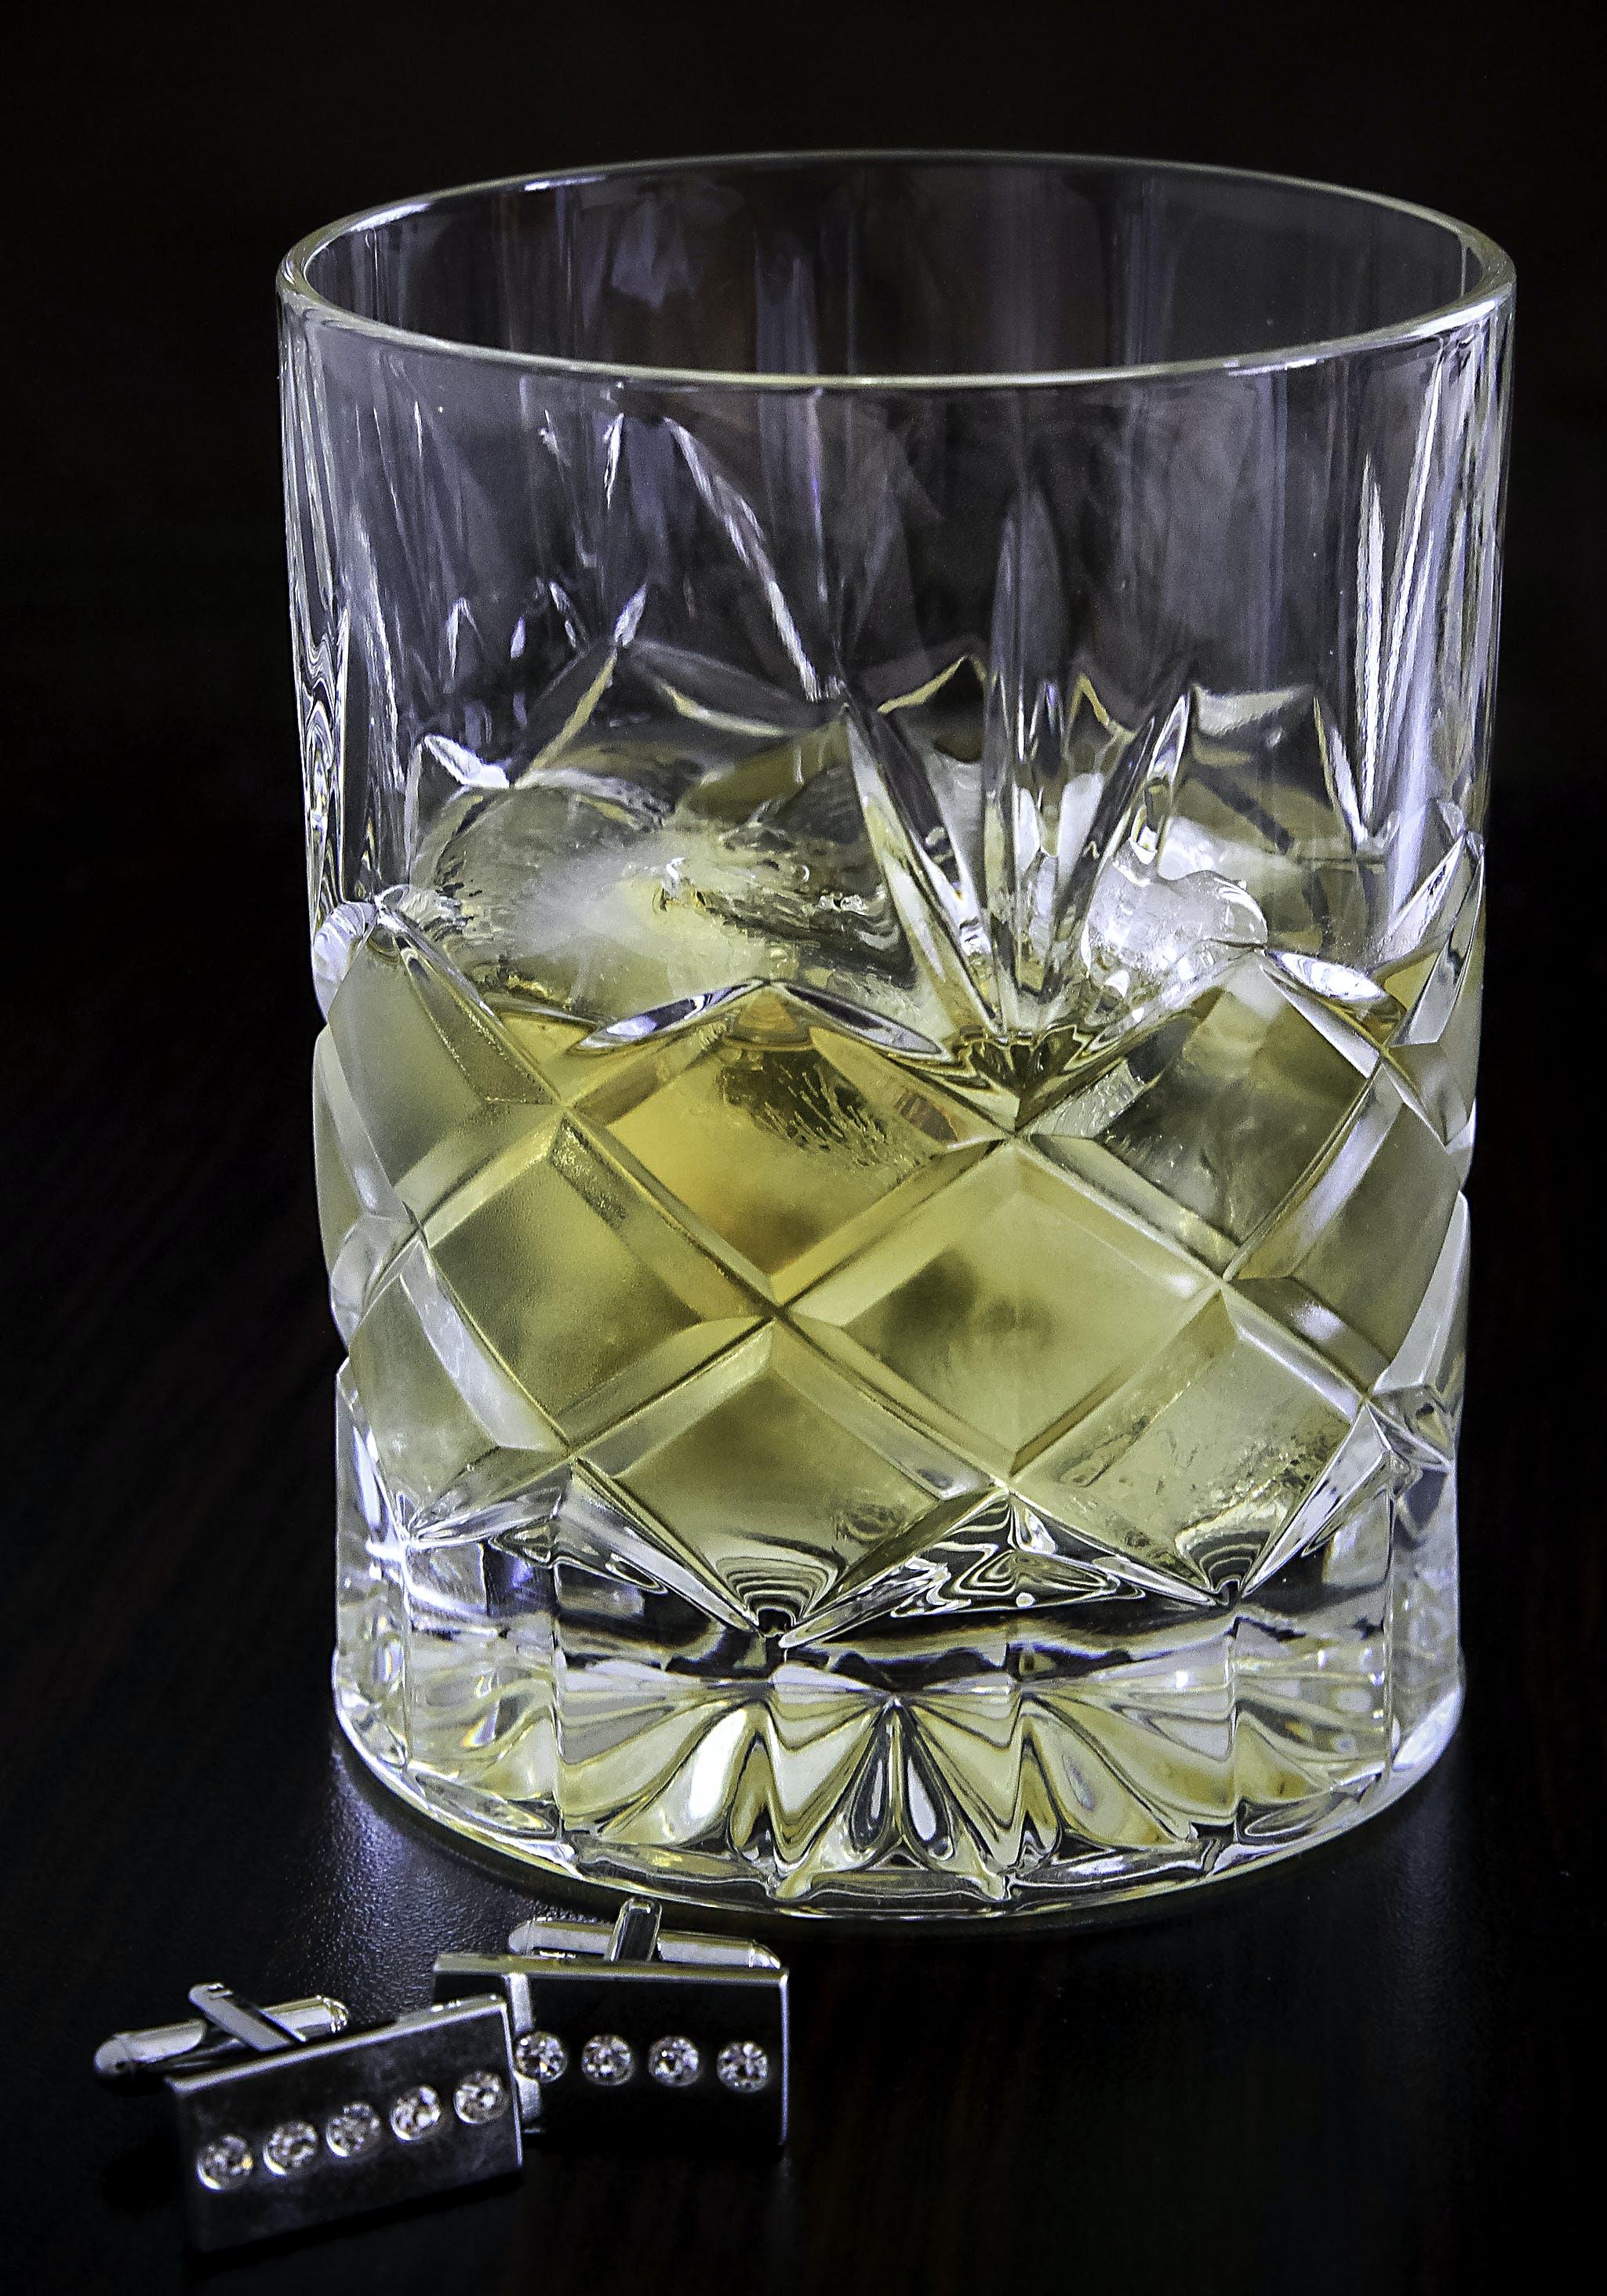 Free stock photo of glass, timeout, whiskey